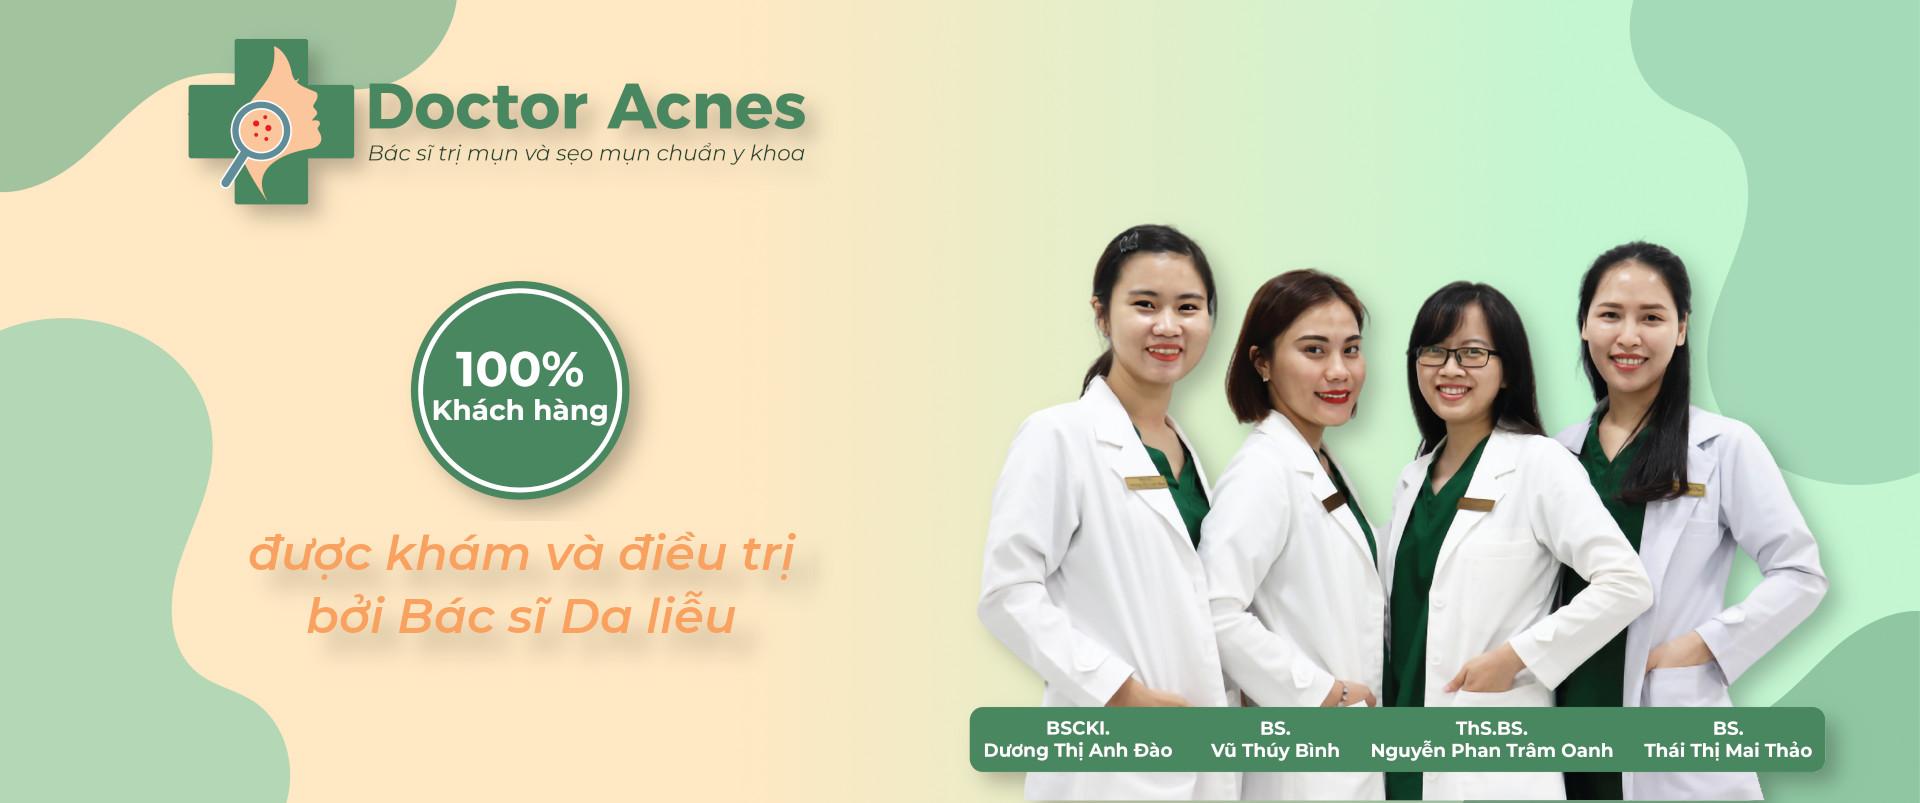 Banner Bác sĩ Da liễu Doctor Acnes 2